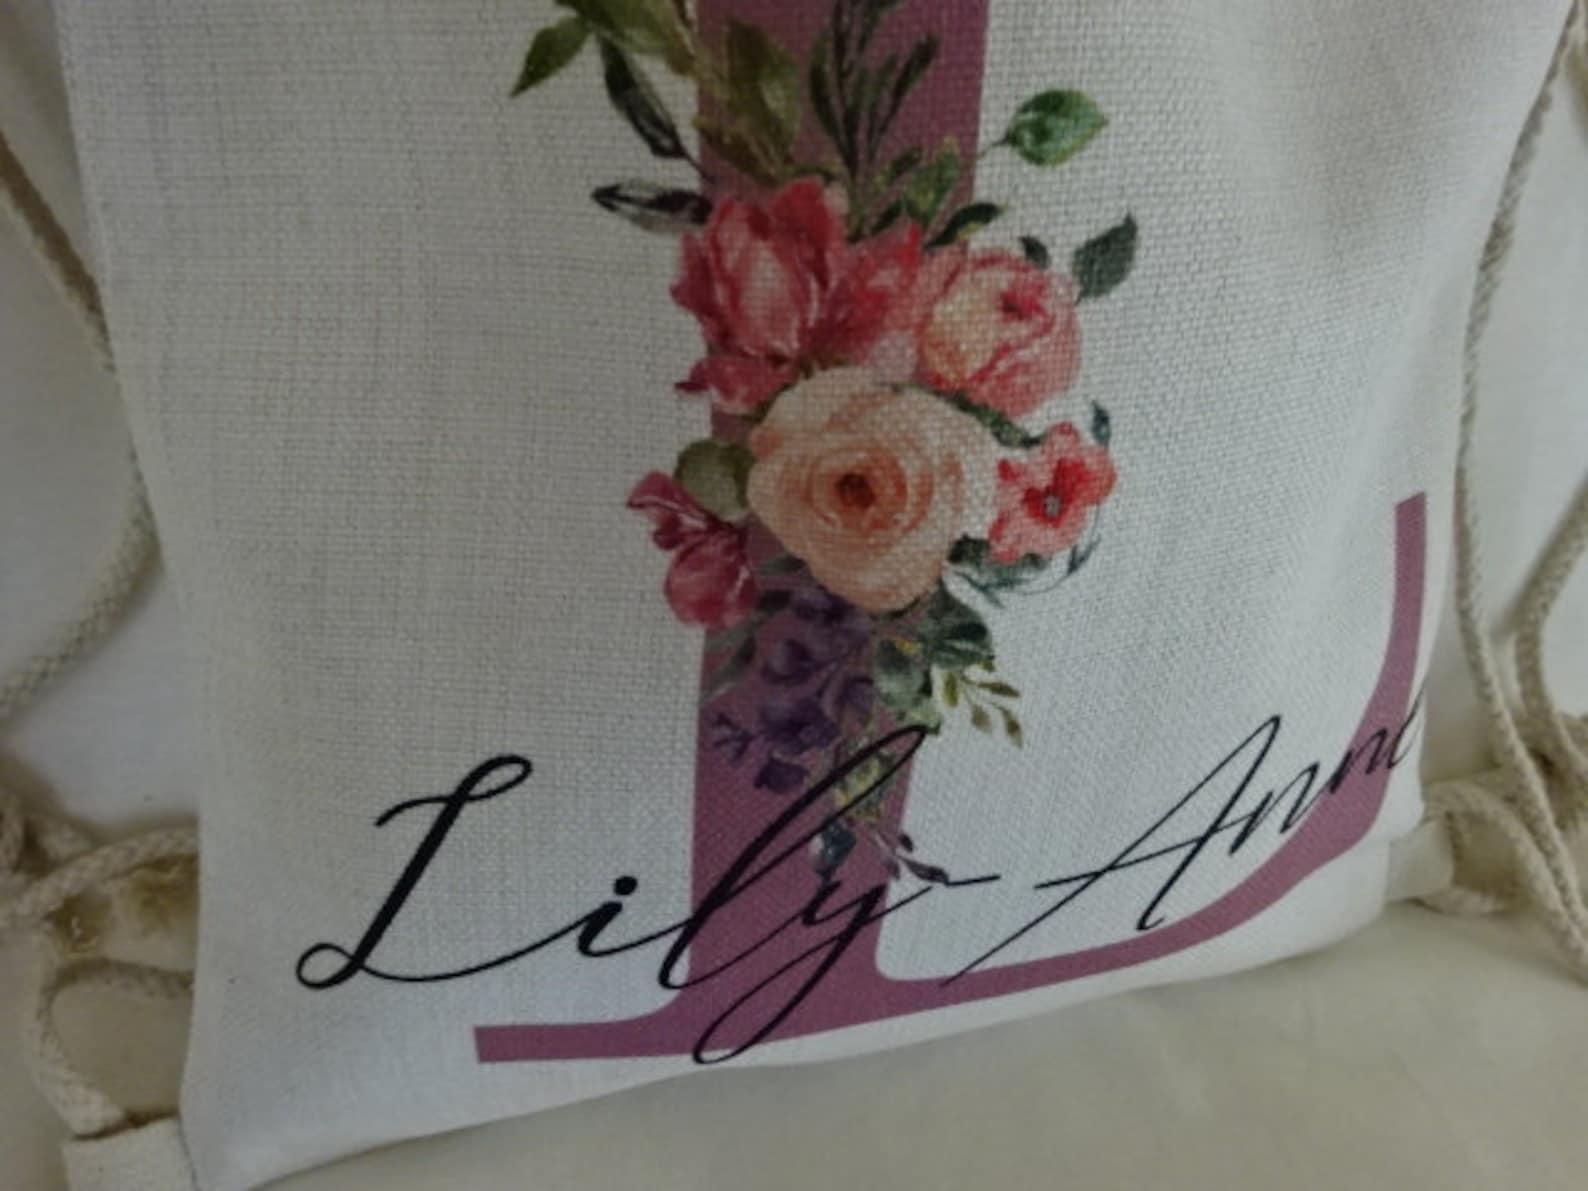 personalised girls drawstring bag, linen,dancer, ballet, dancing shoes, daughter, teacher, god-daughter, niece, sister gift